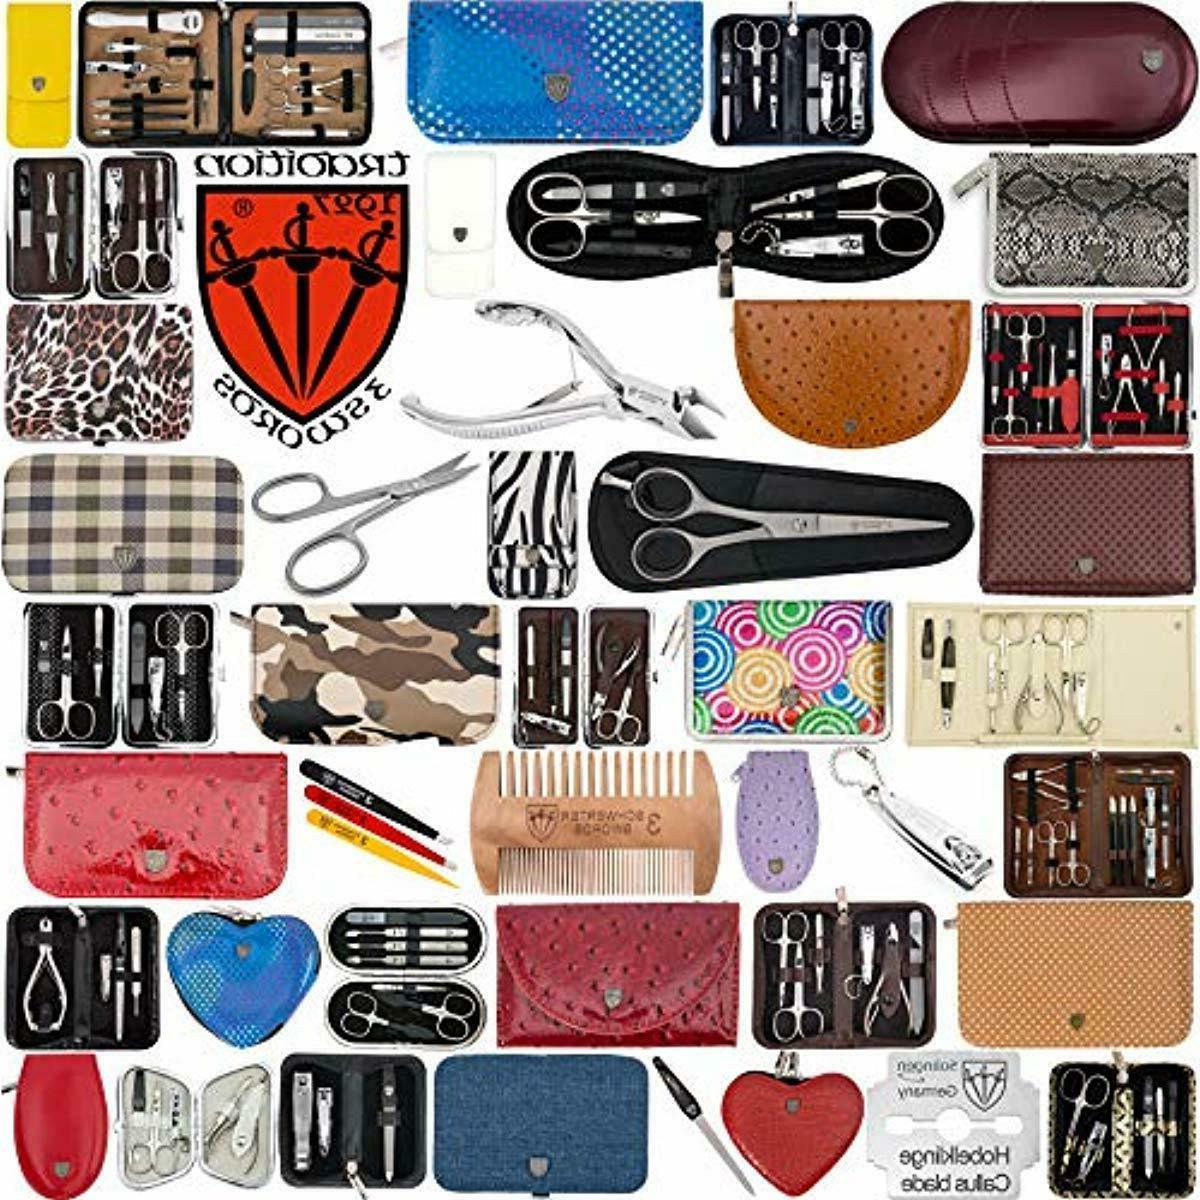 Sapphire Manicure & Care